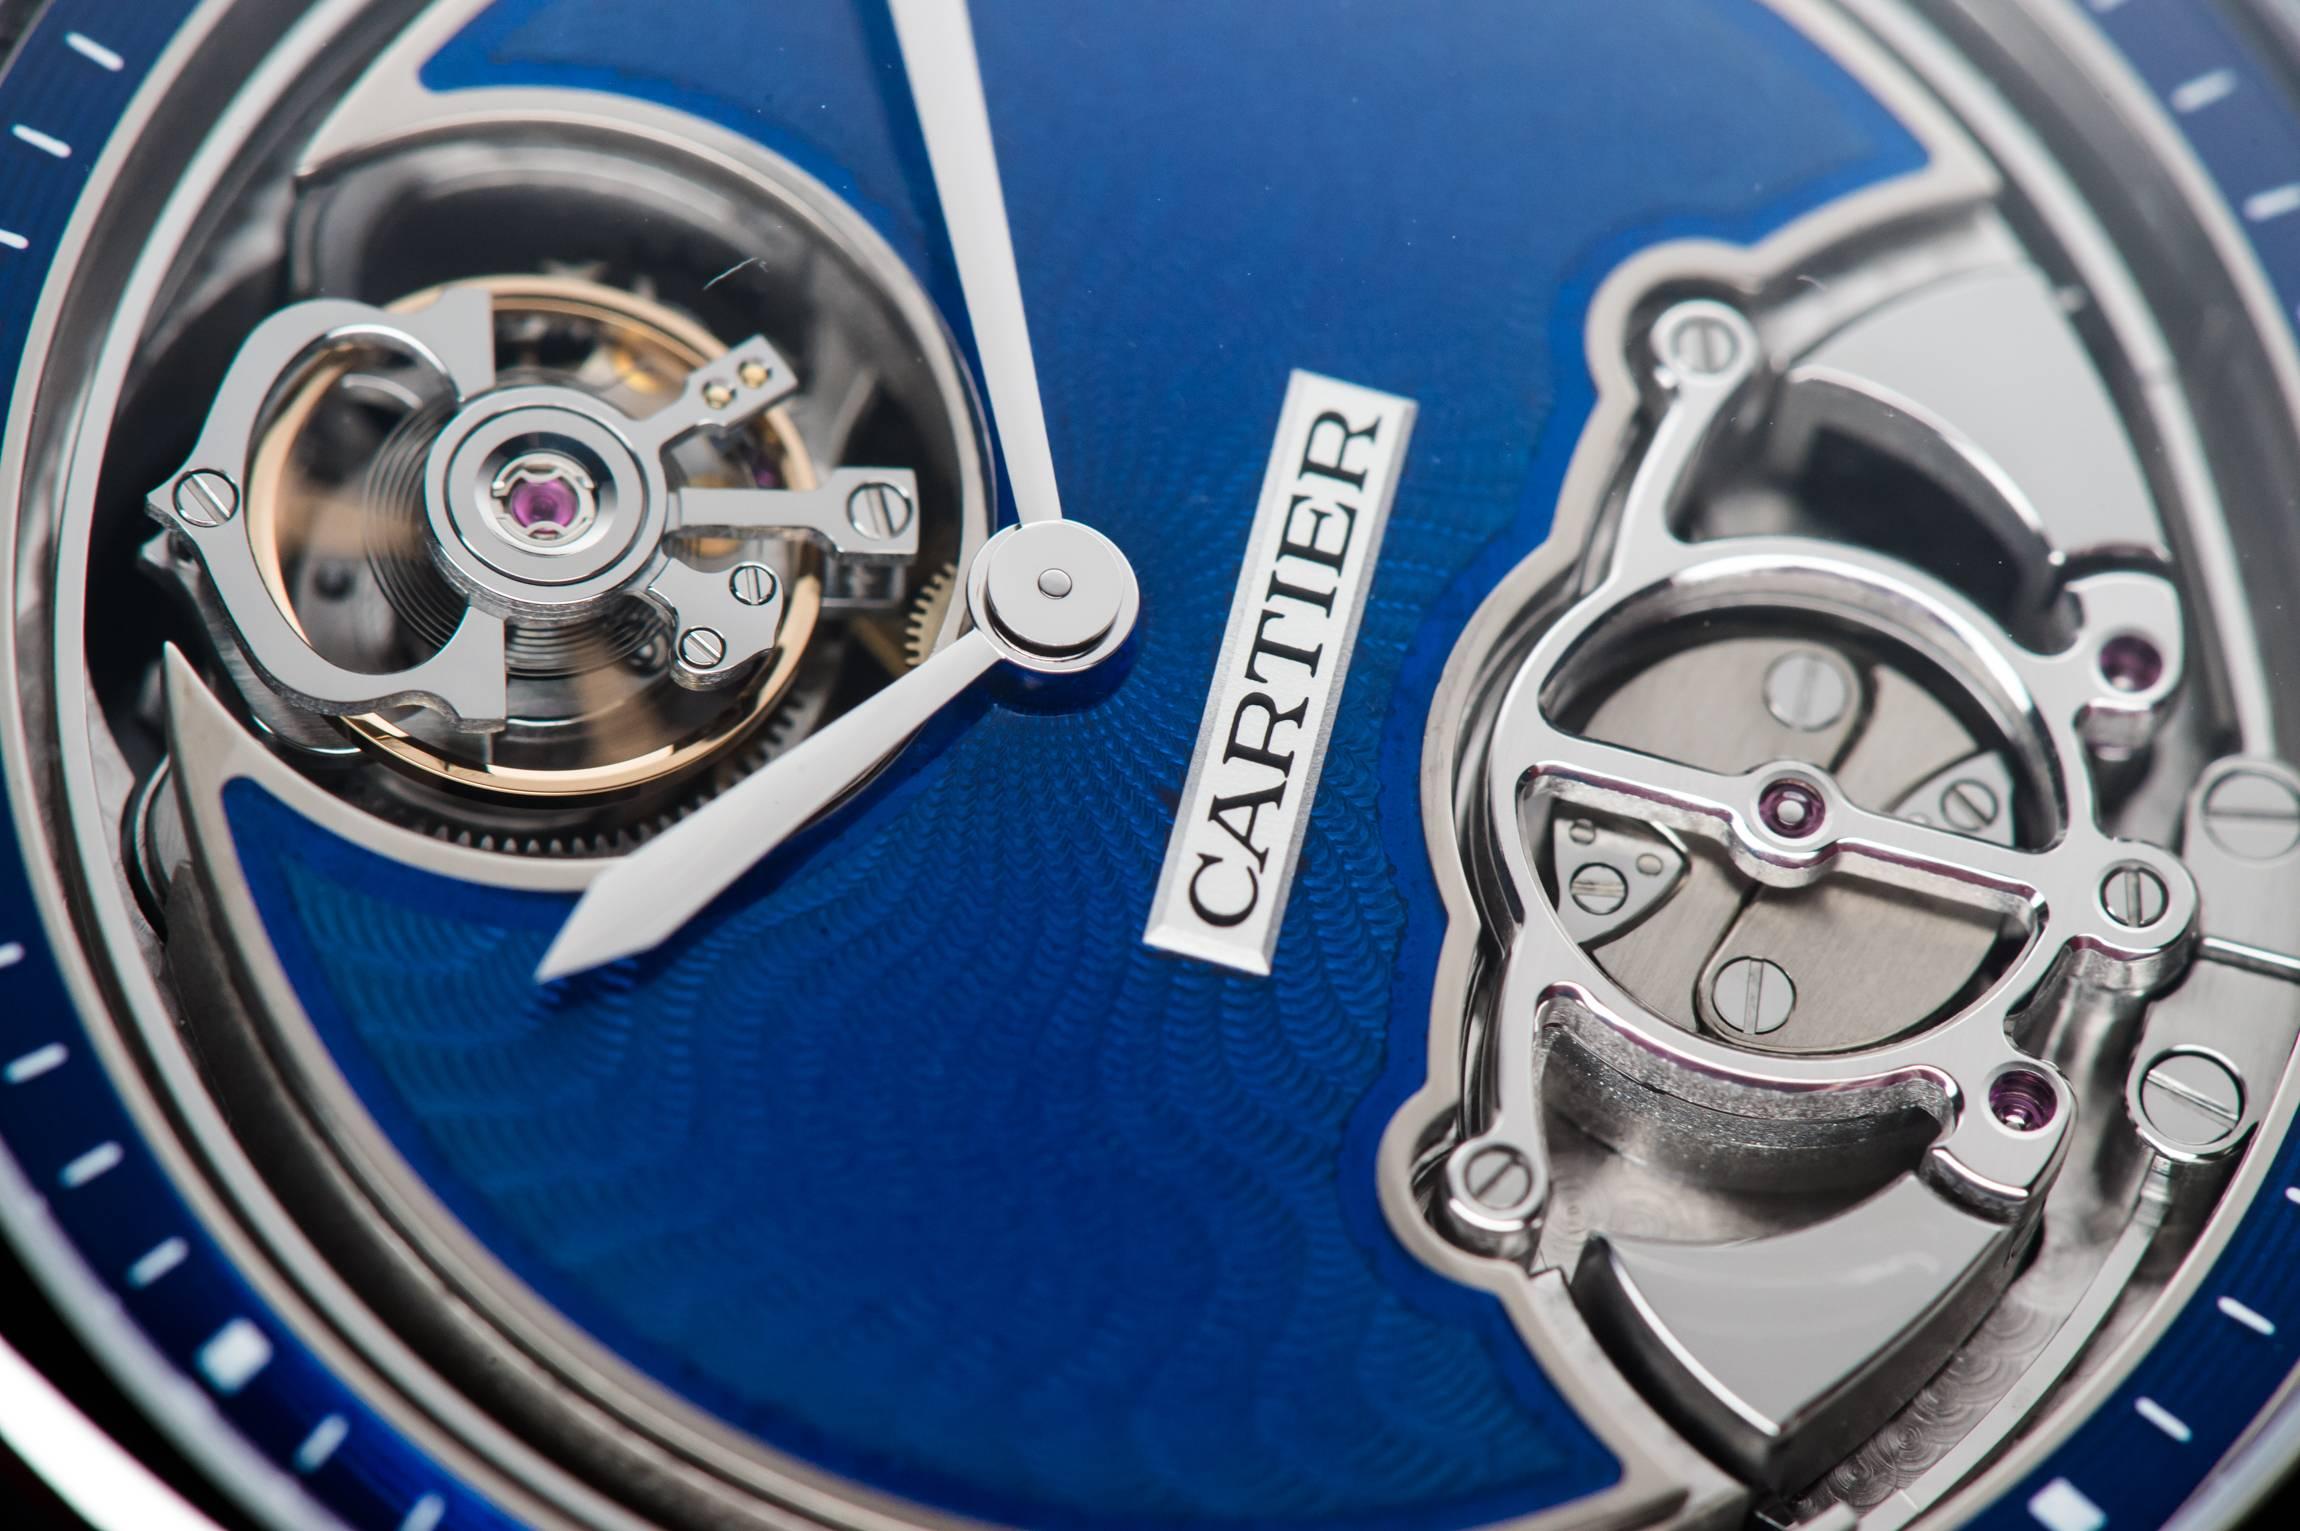 "Cartier Rotonde de Cartier Minute Repeater Flying Tourbillon Calibre 9402 MC ""Poinçon de genève"" certified watch close up"